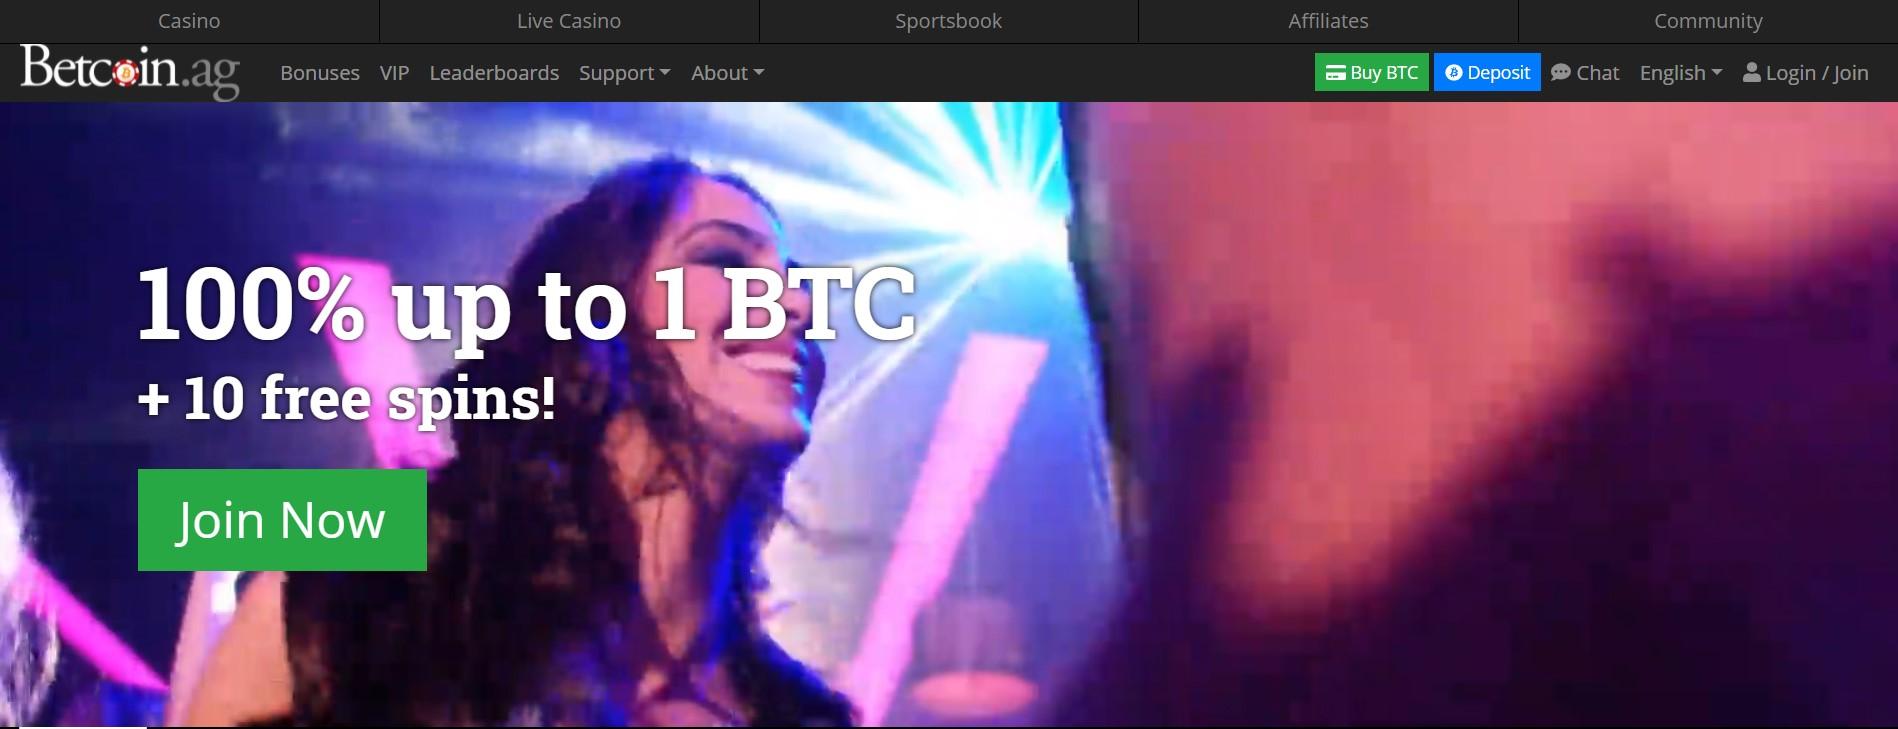 betcoinag welcome bonus page screenshot